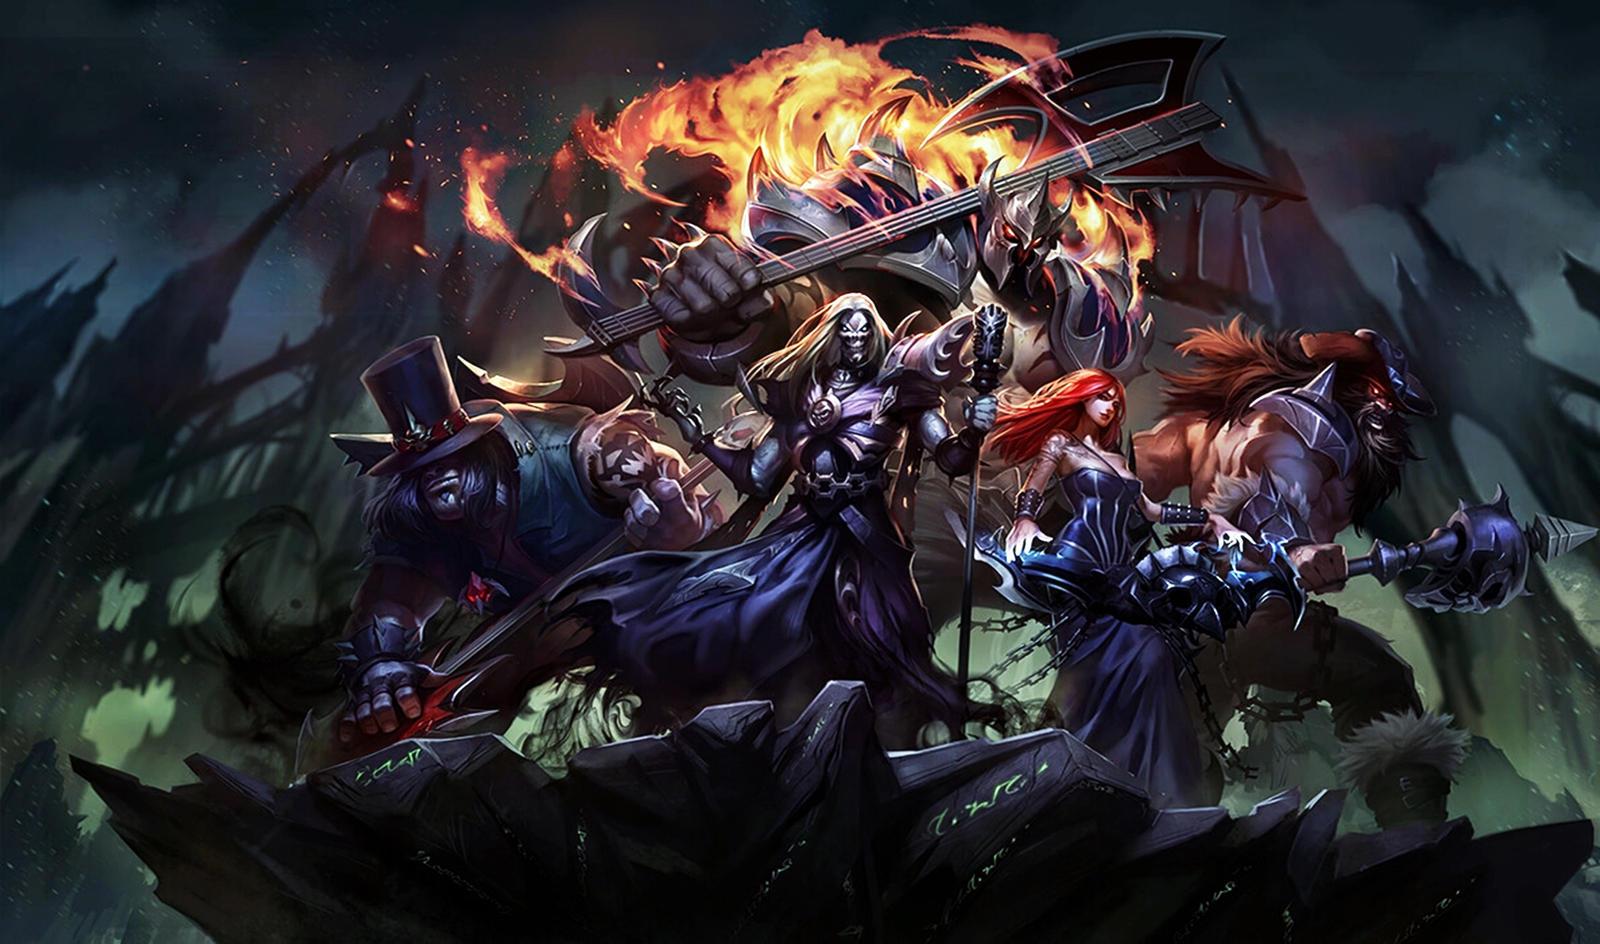 ... PopokuPinguPop90 [League of Legends] Yorick [Pentakill] (Wallpaper) by PopokuPinguPop90